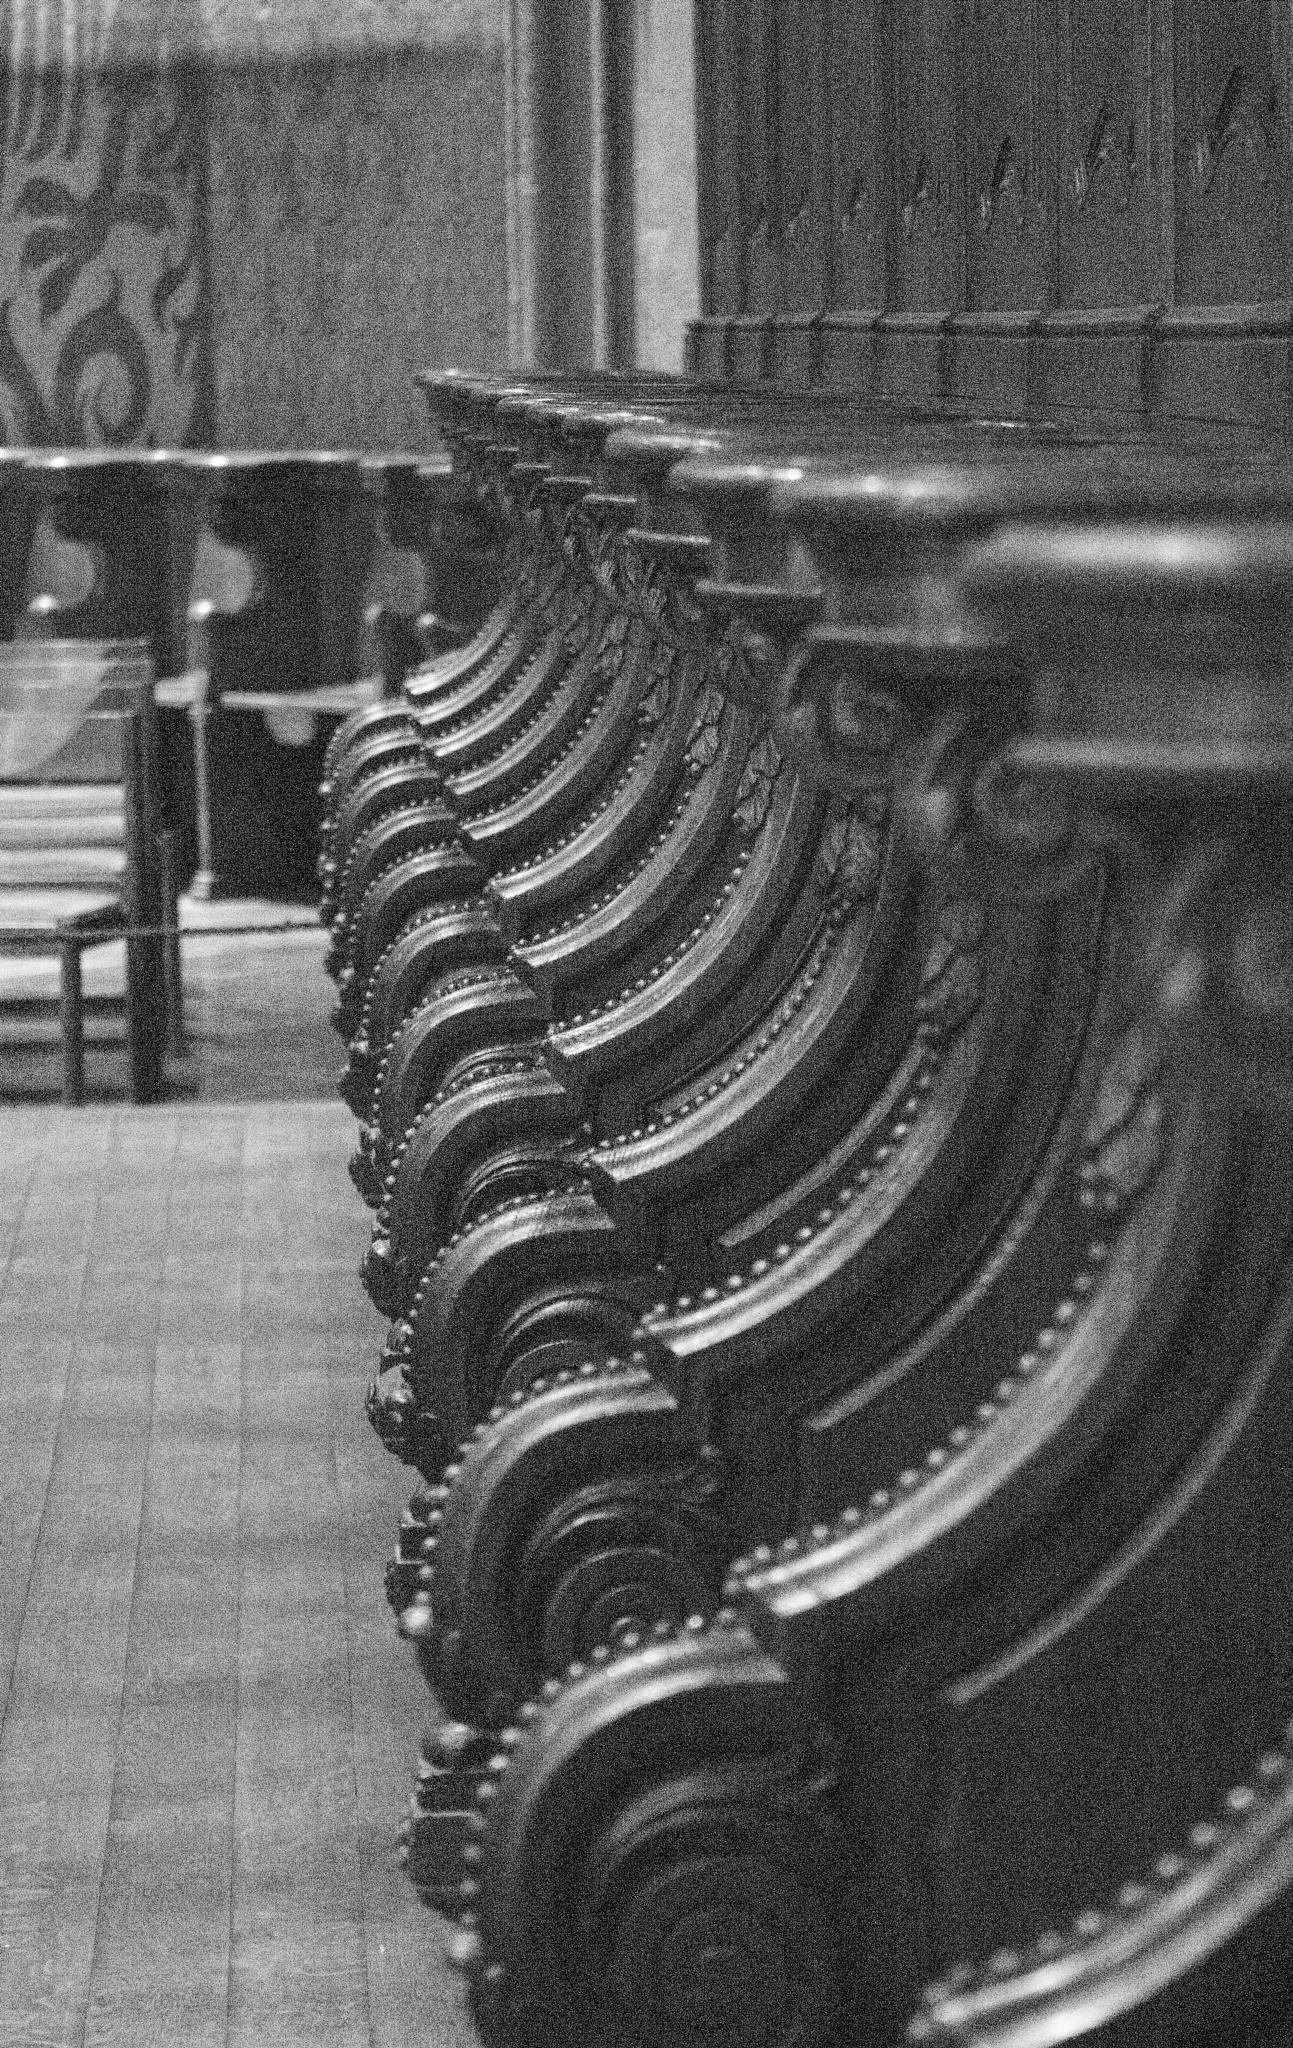 Church pews by ejk41